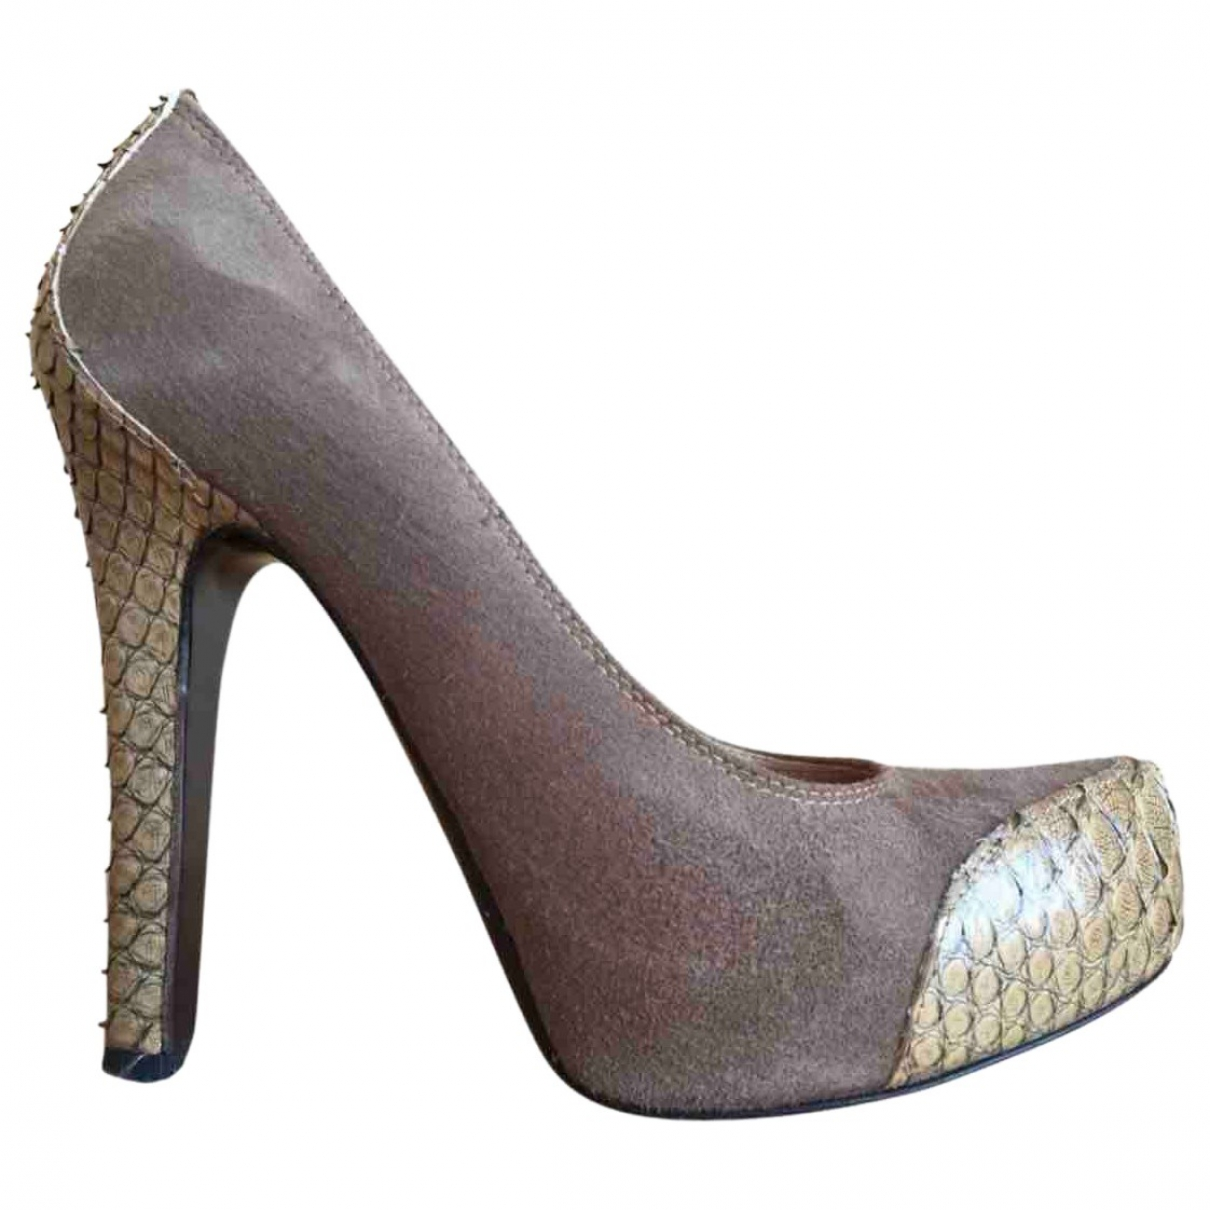 Gianmarco Lorenzi - Escarpins   pour femme en serpent deau - beige